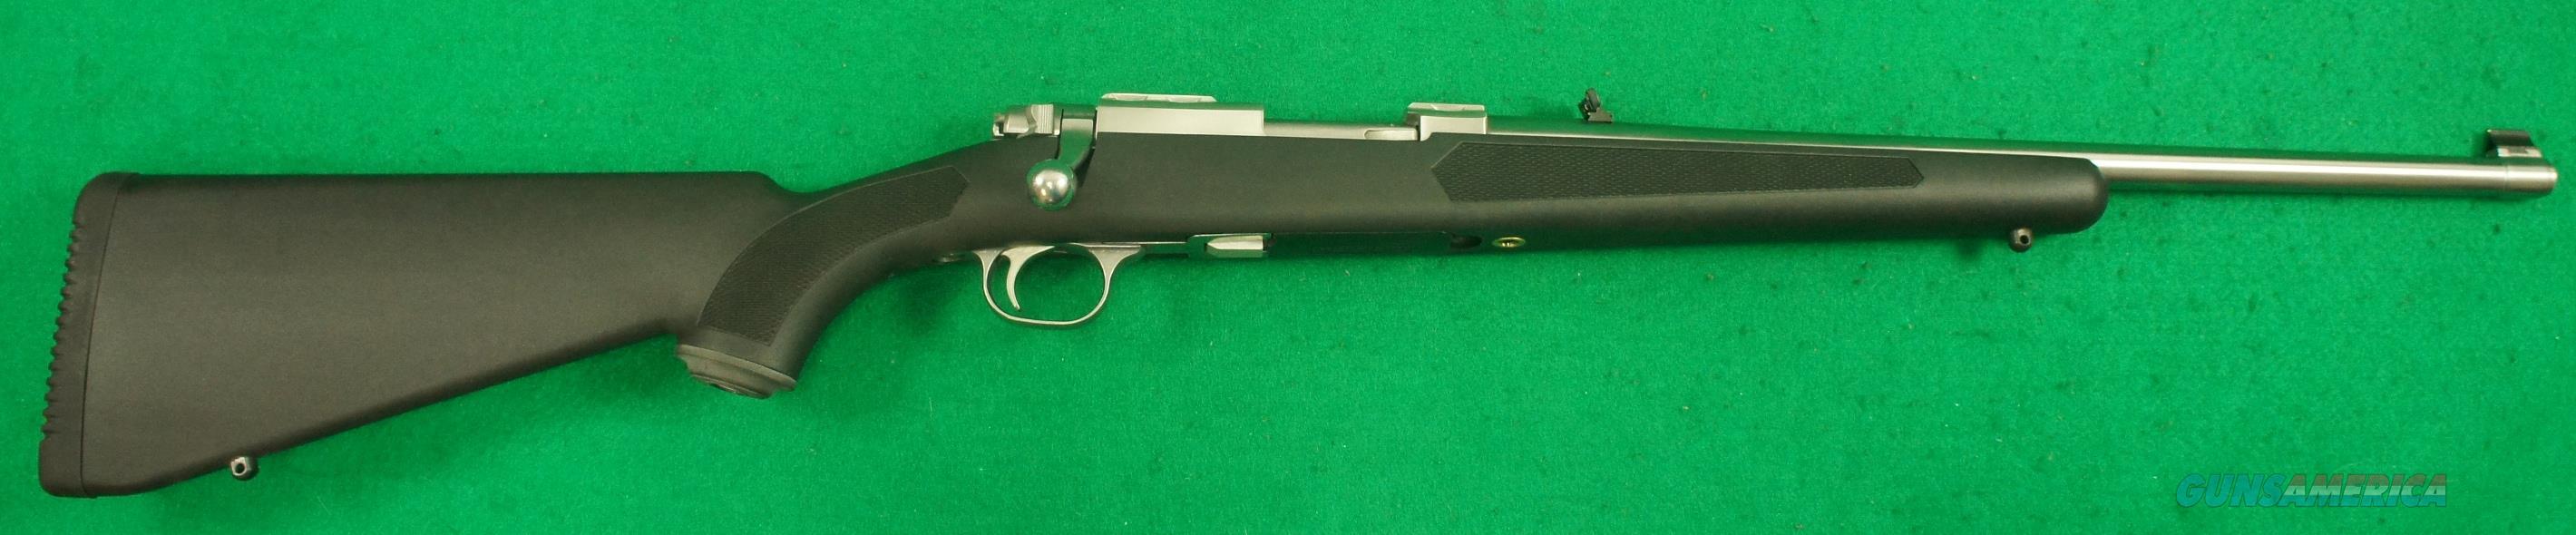 K77/44 SS 44Mag 18.5In  7402  Guns > Pistols > S Misc Pistols